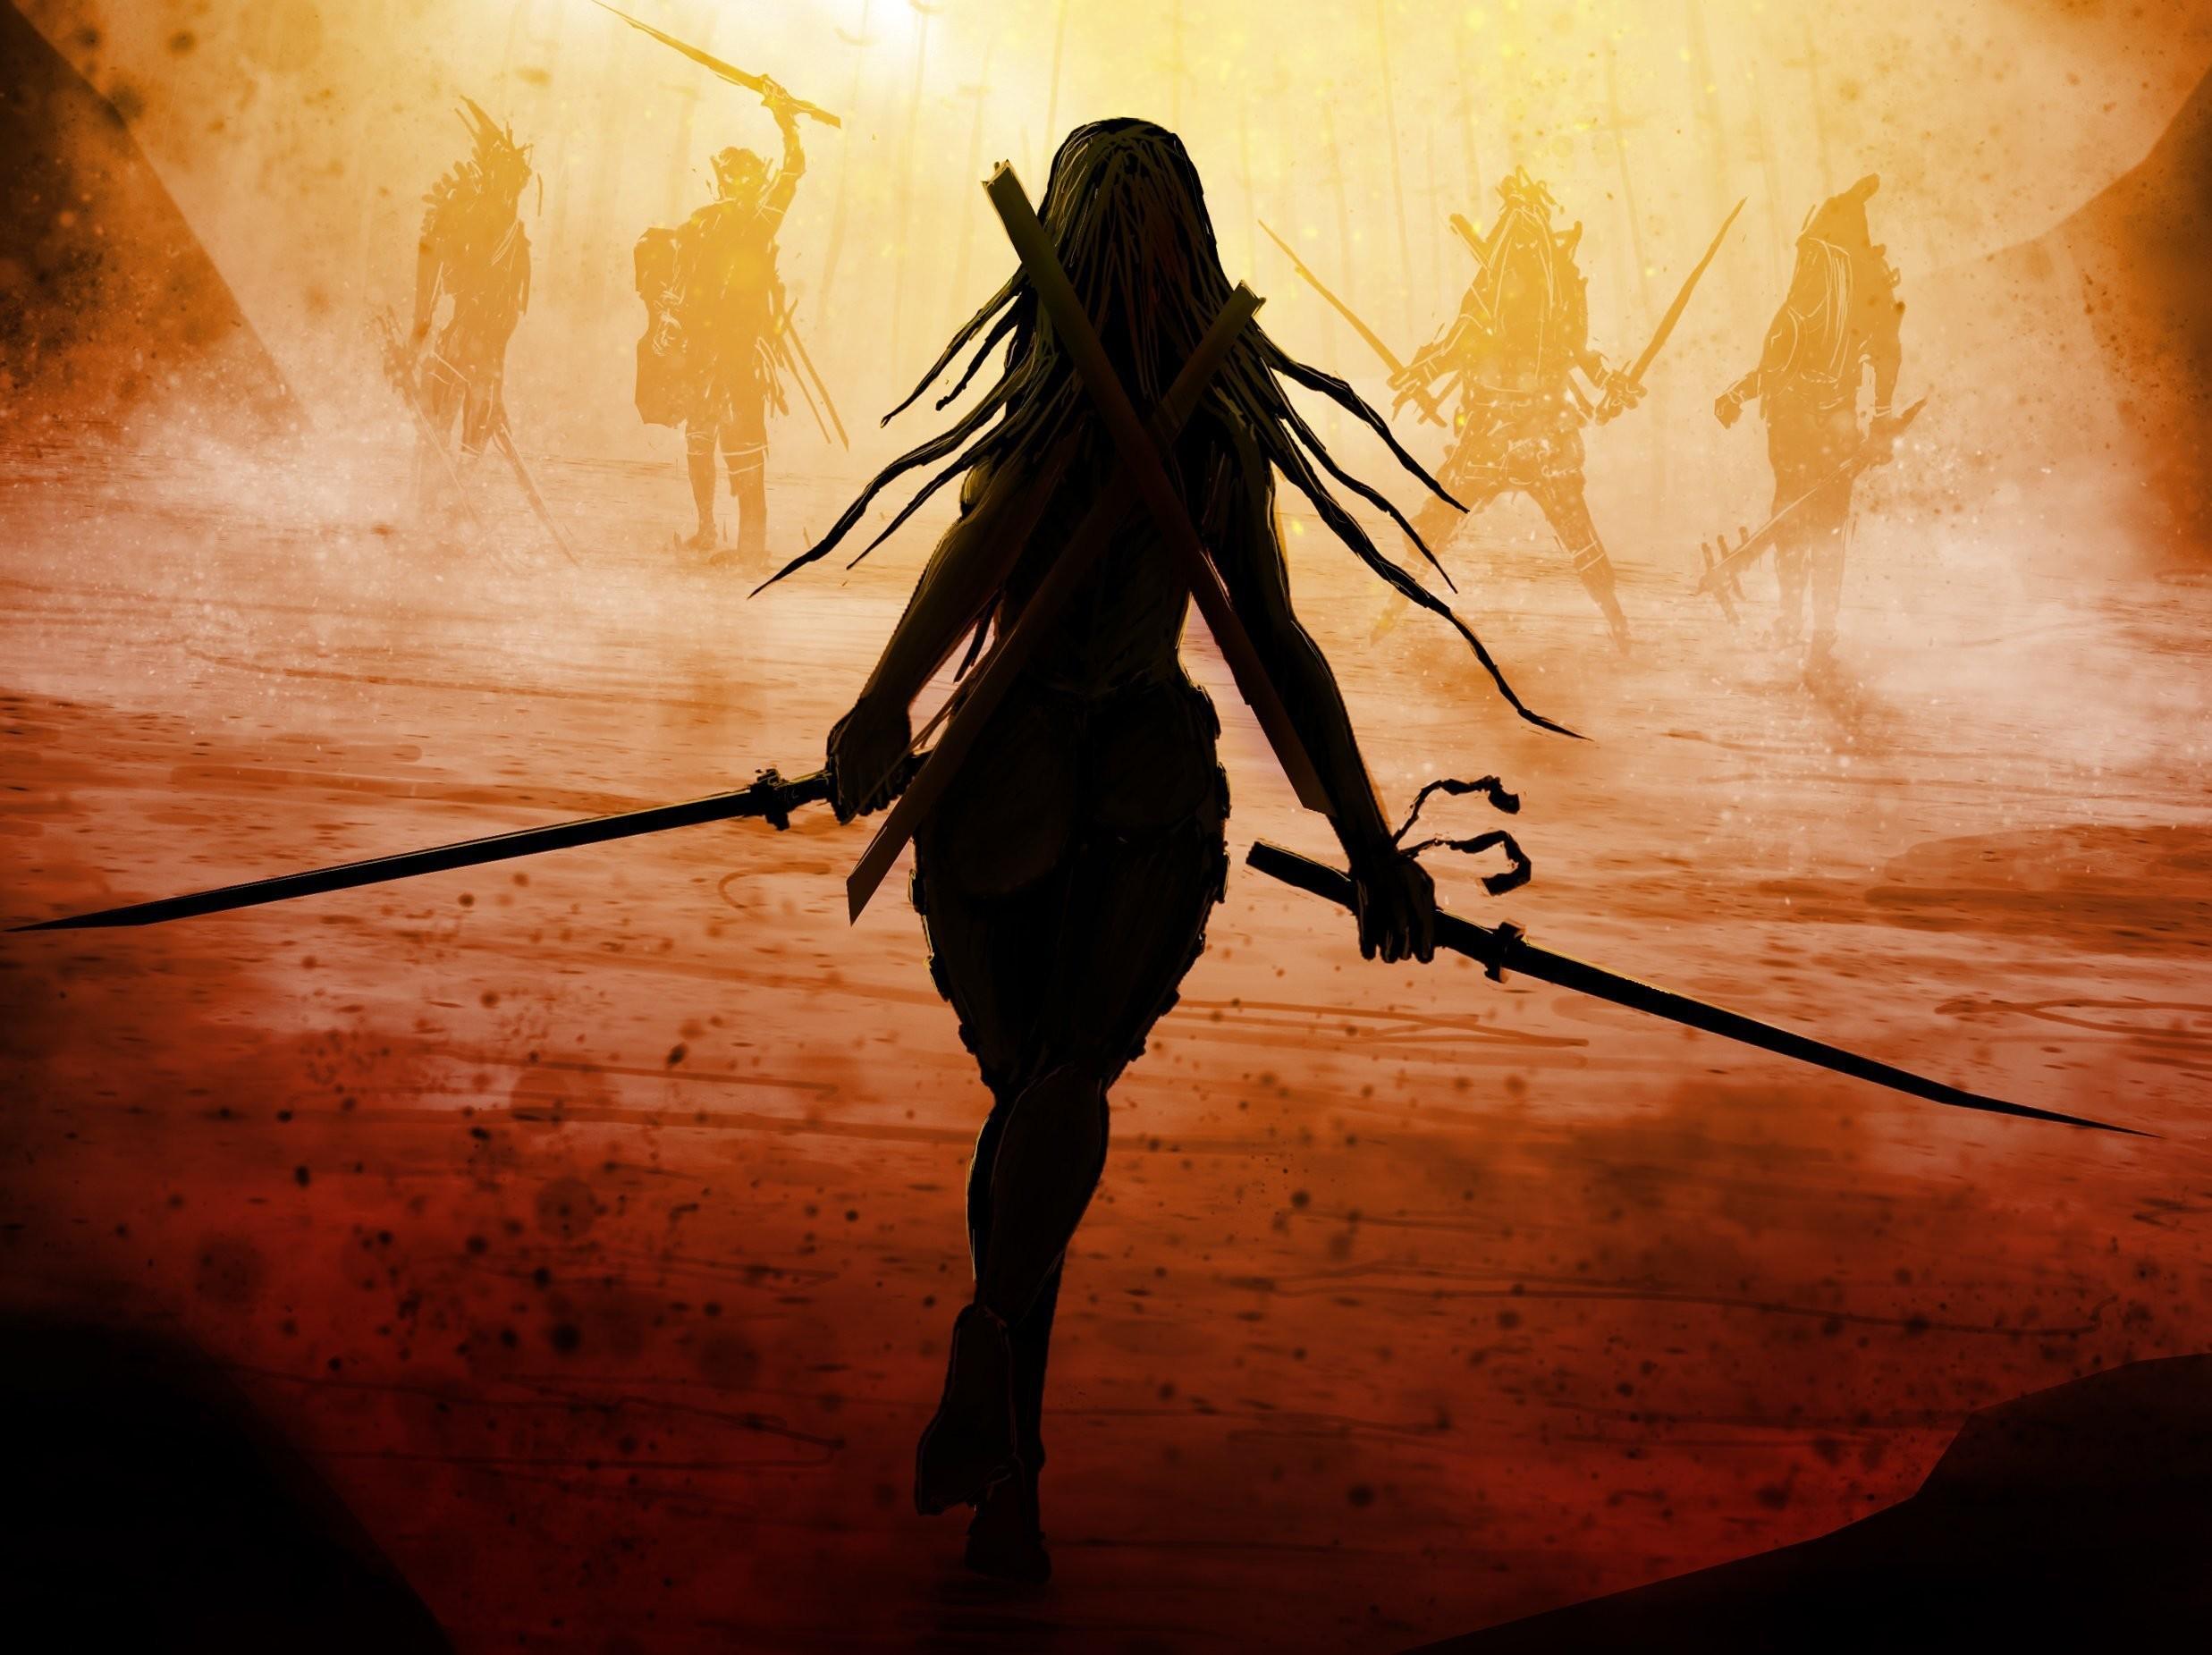 fantasy anime warrior guy | Graceful girl, warrior, sword, fog .